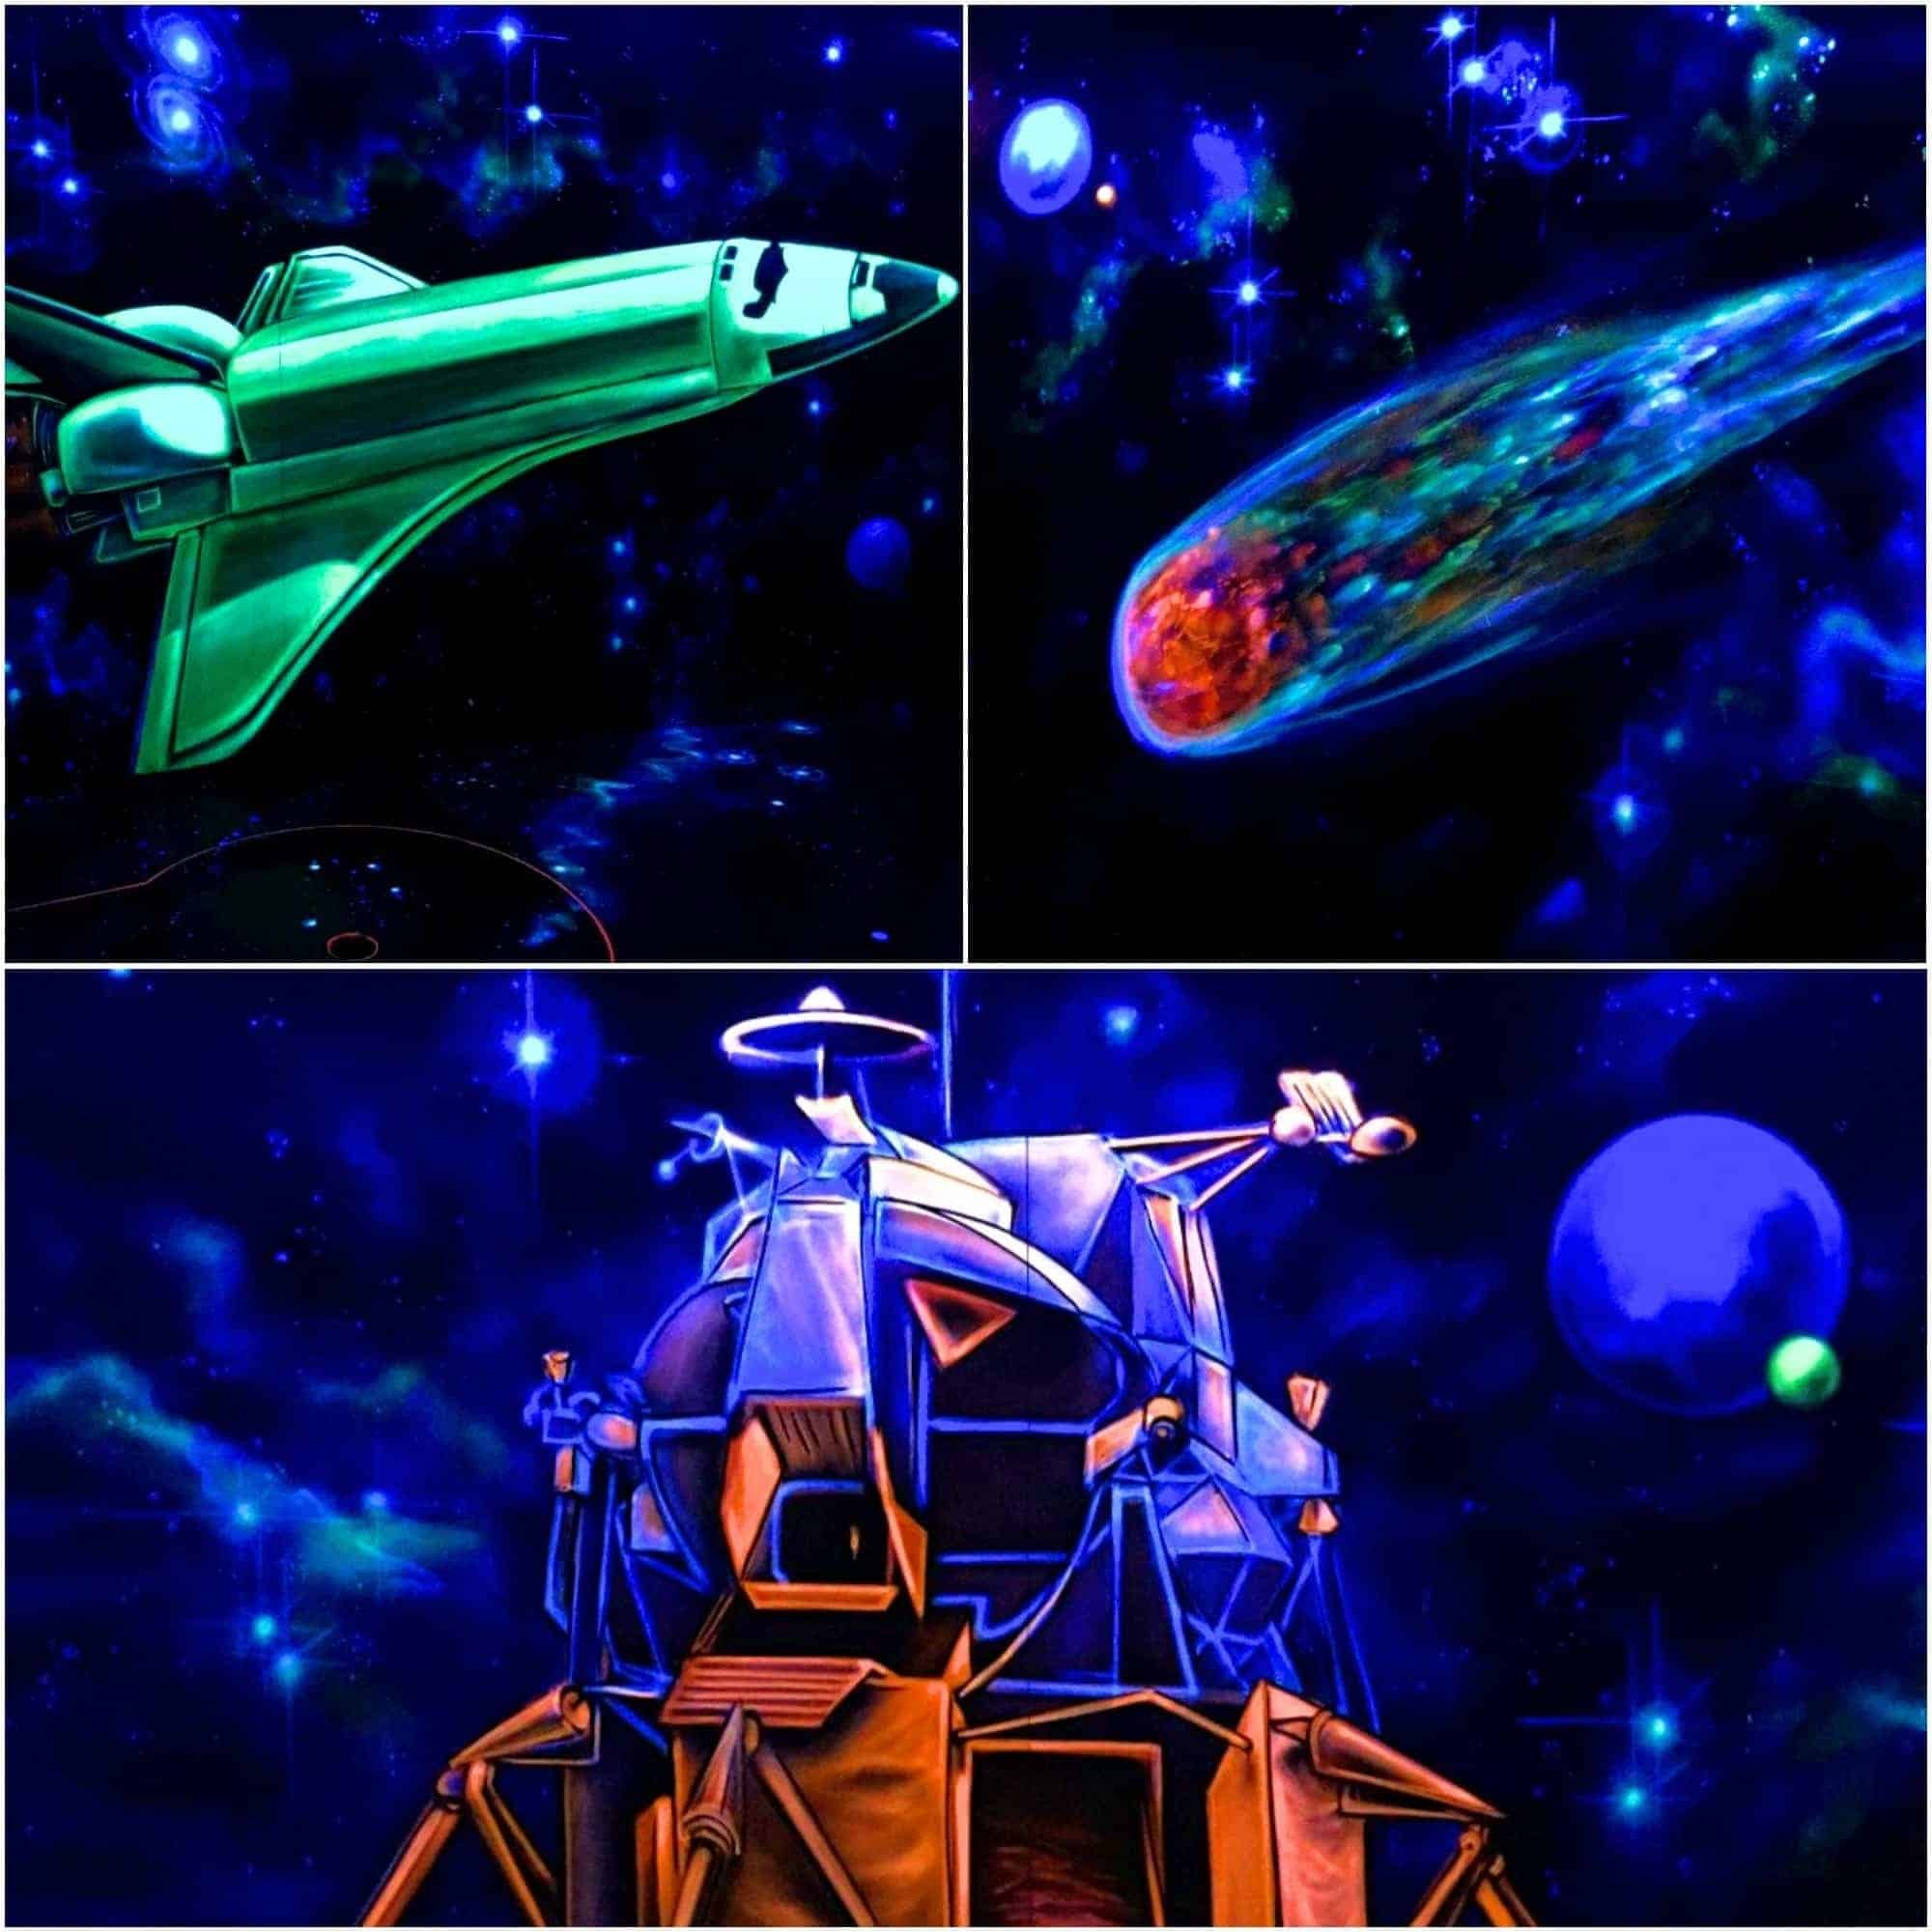 Style Hannover Neongolf Weltall - NeonGolf = Minigolf 4.0